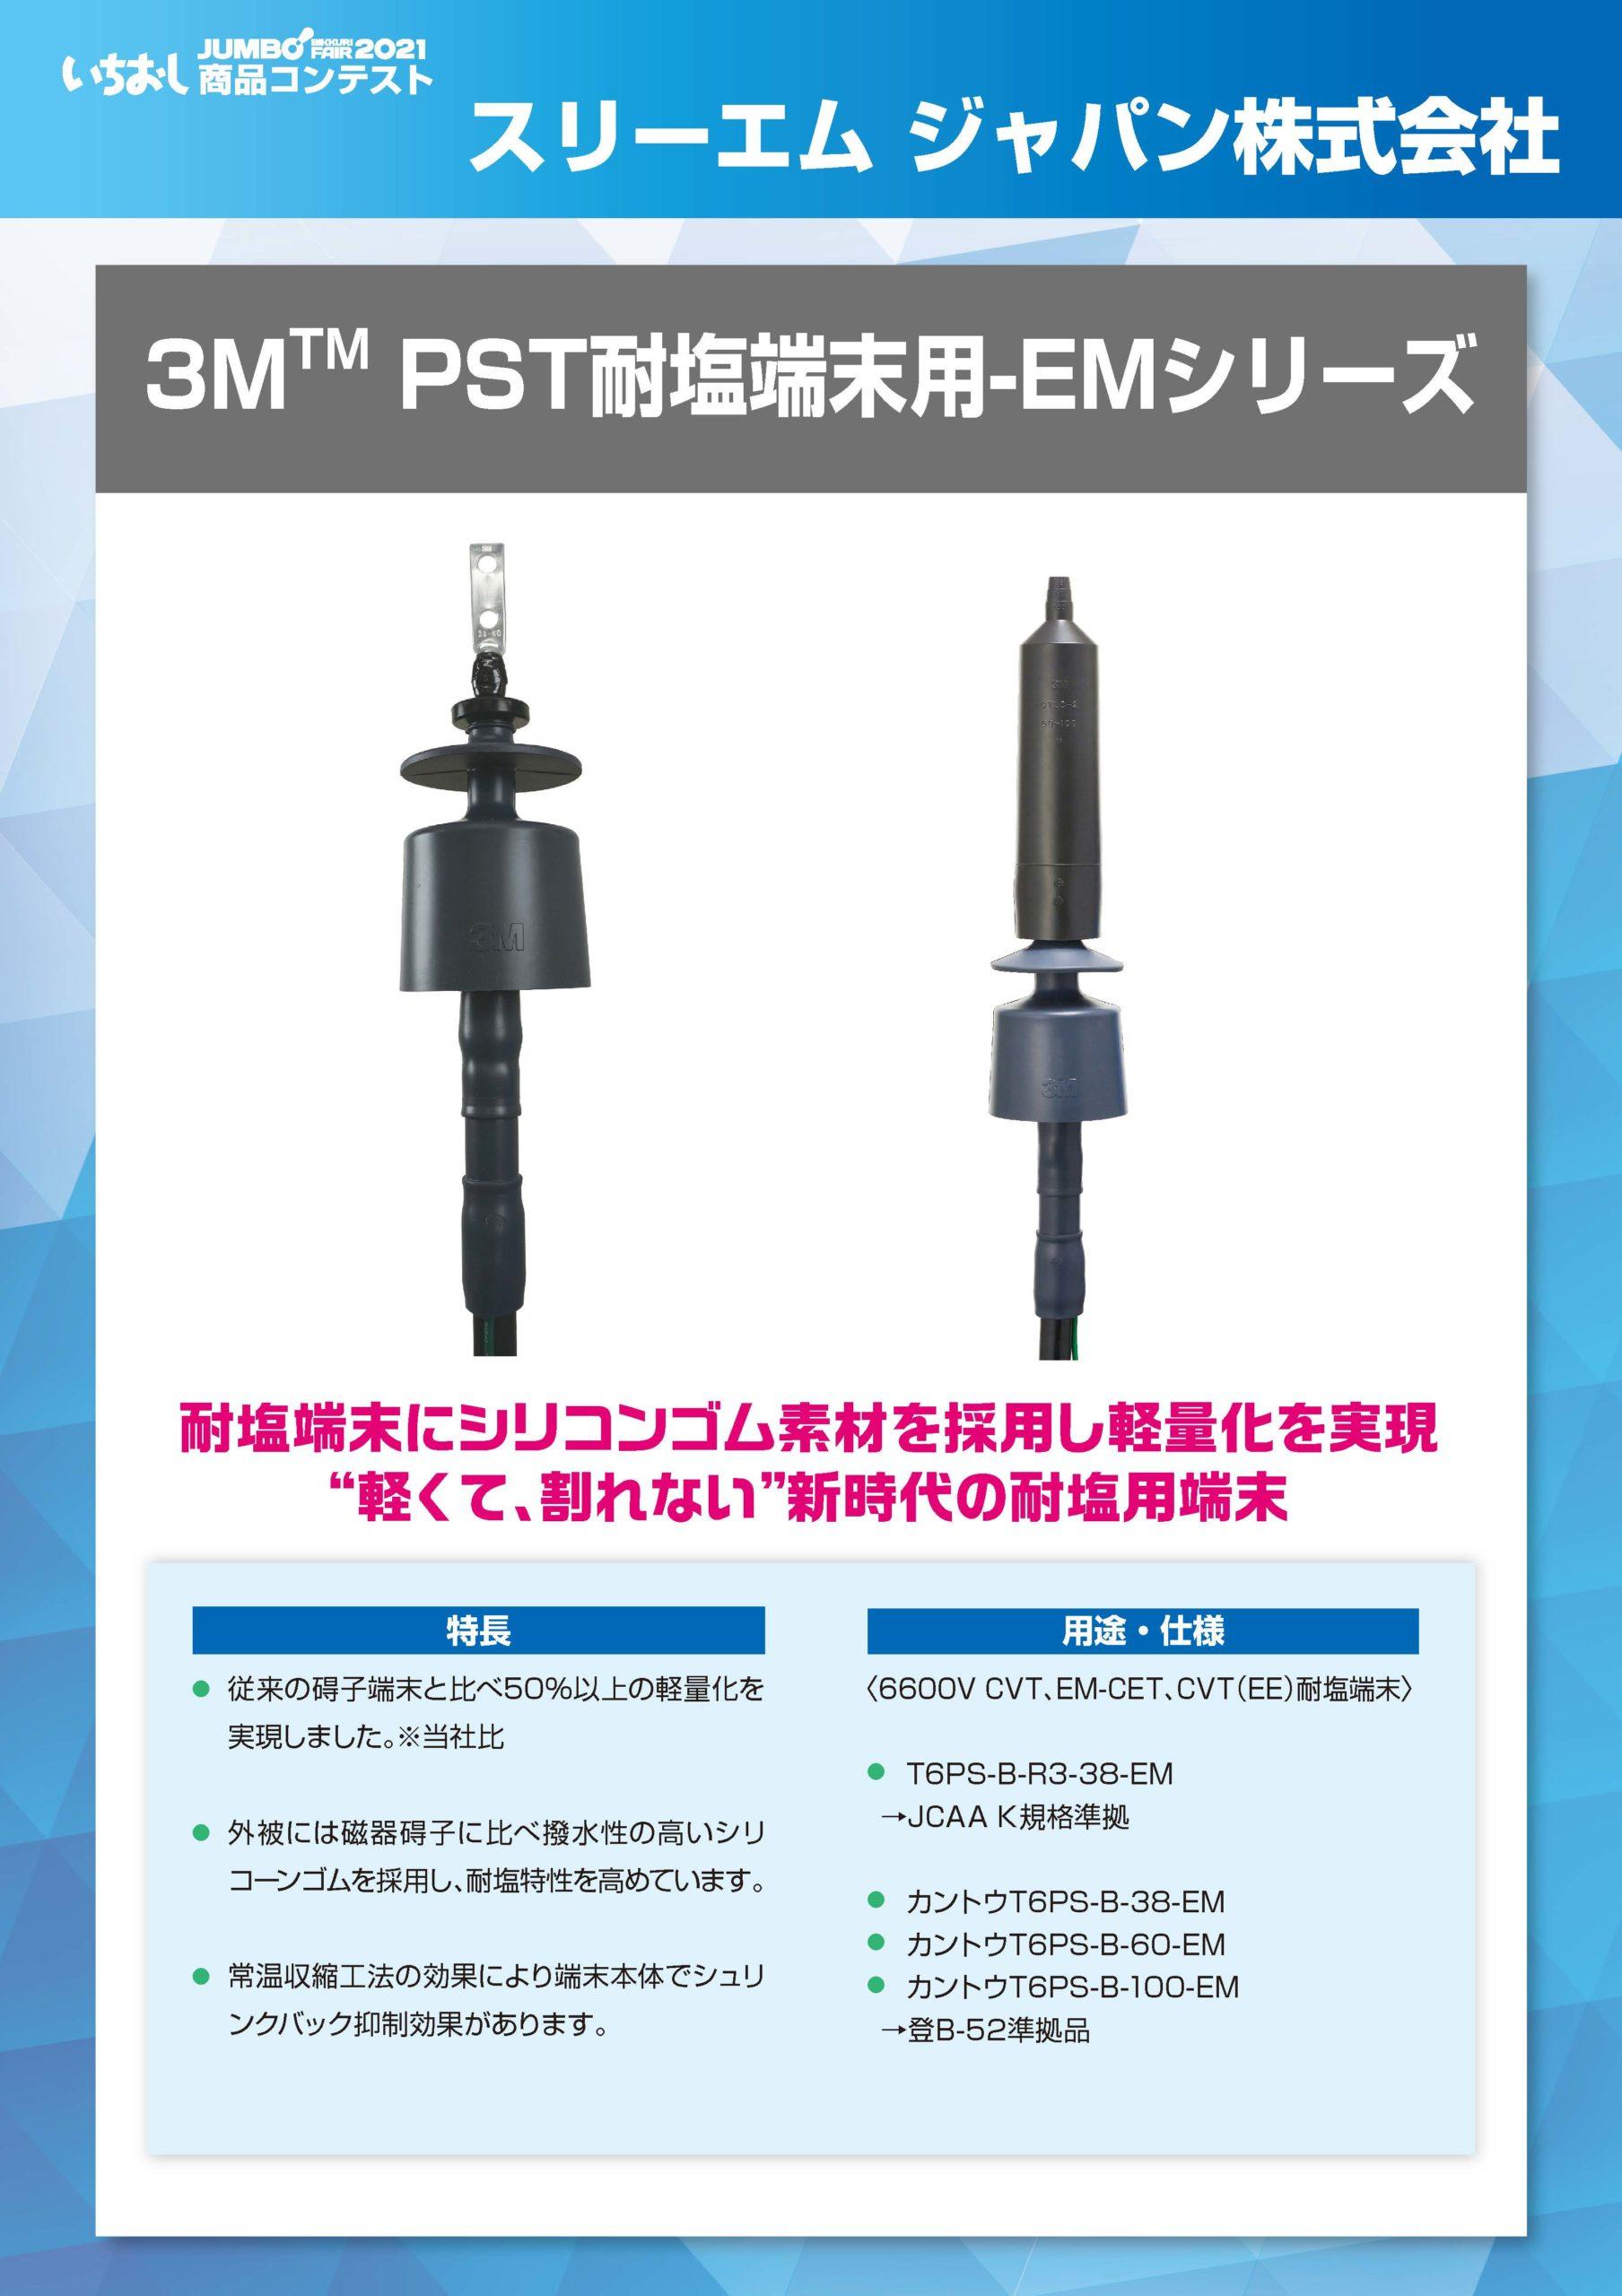 「3MTM PST耐塩端末用-EMシリーズ」スリーエム ジャパン株式会社の画像